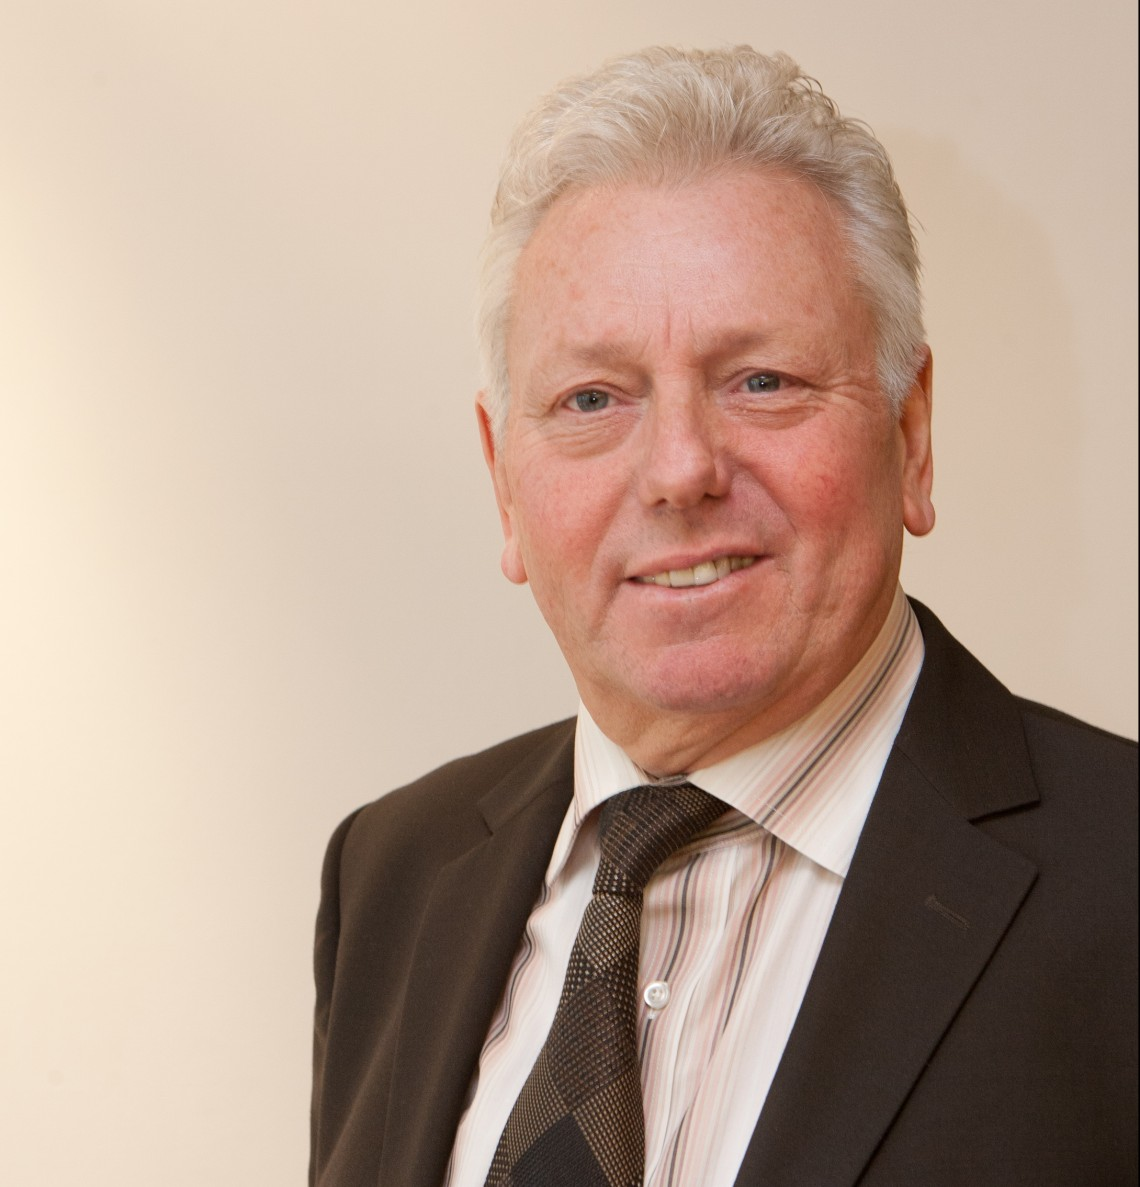 Martin Ainscough